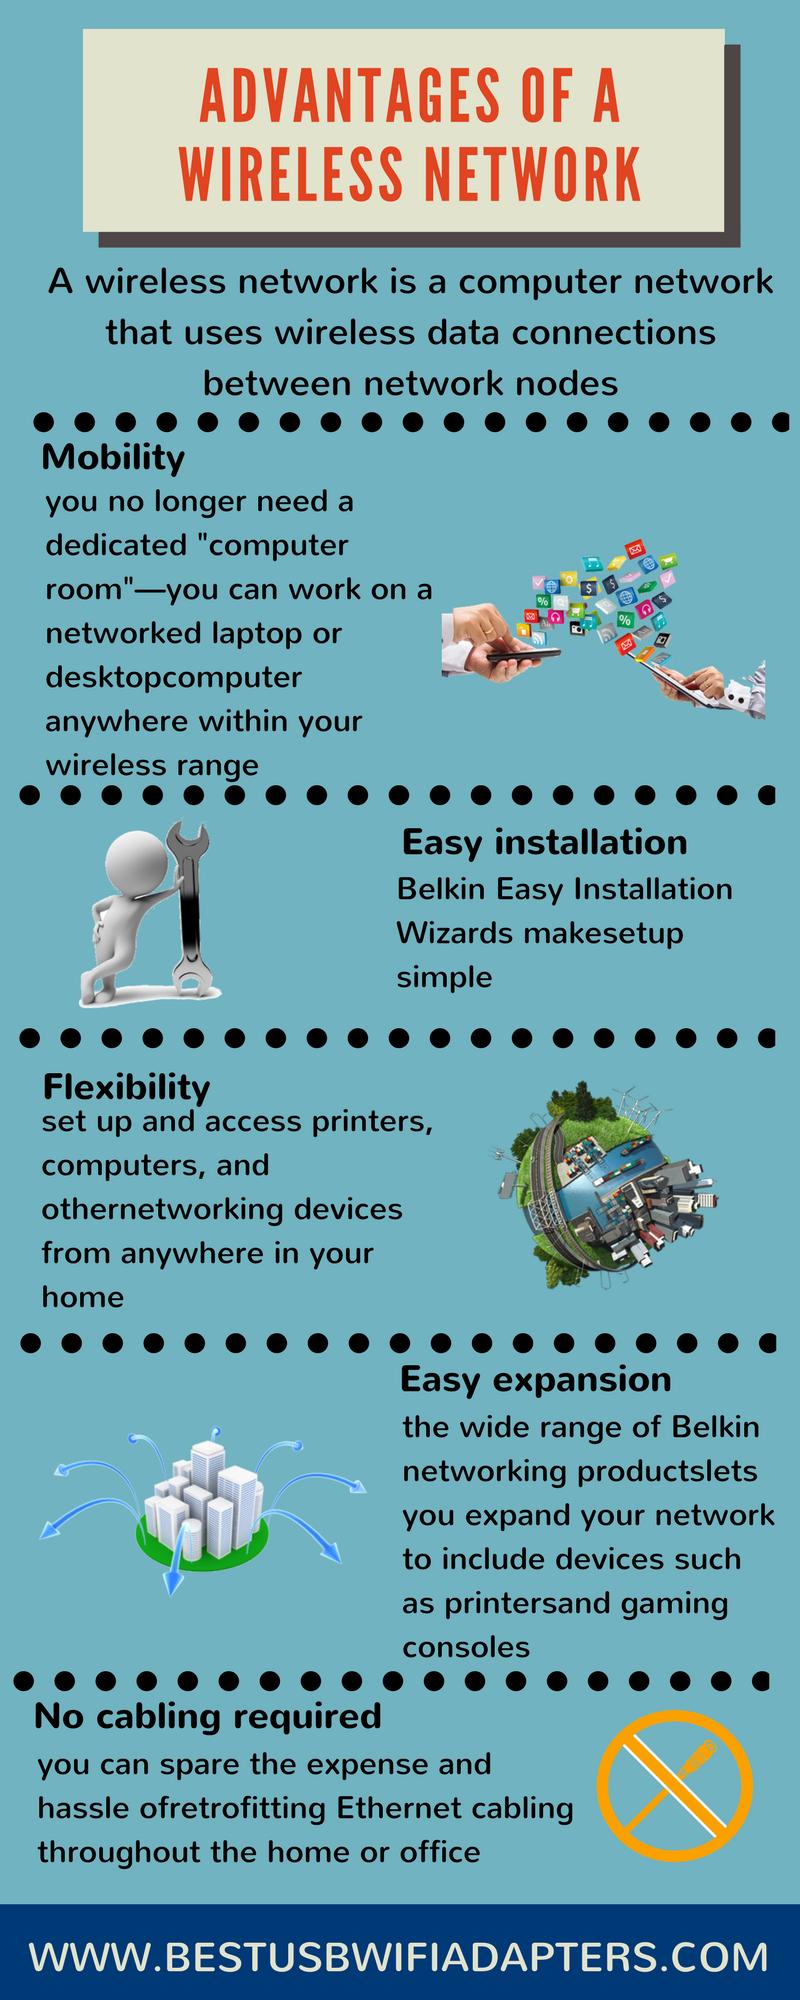 Pin by USB WiFi Adapter on USB Wireless Adapter | Pinterest ...